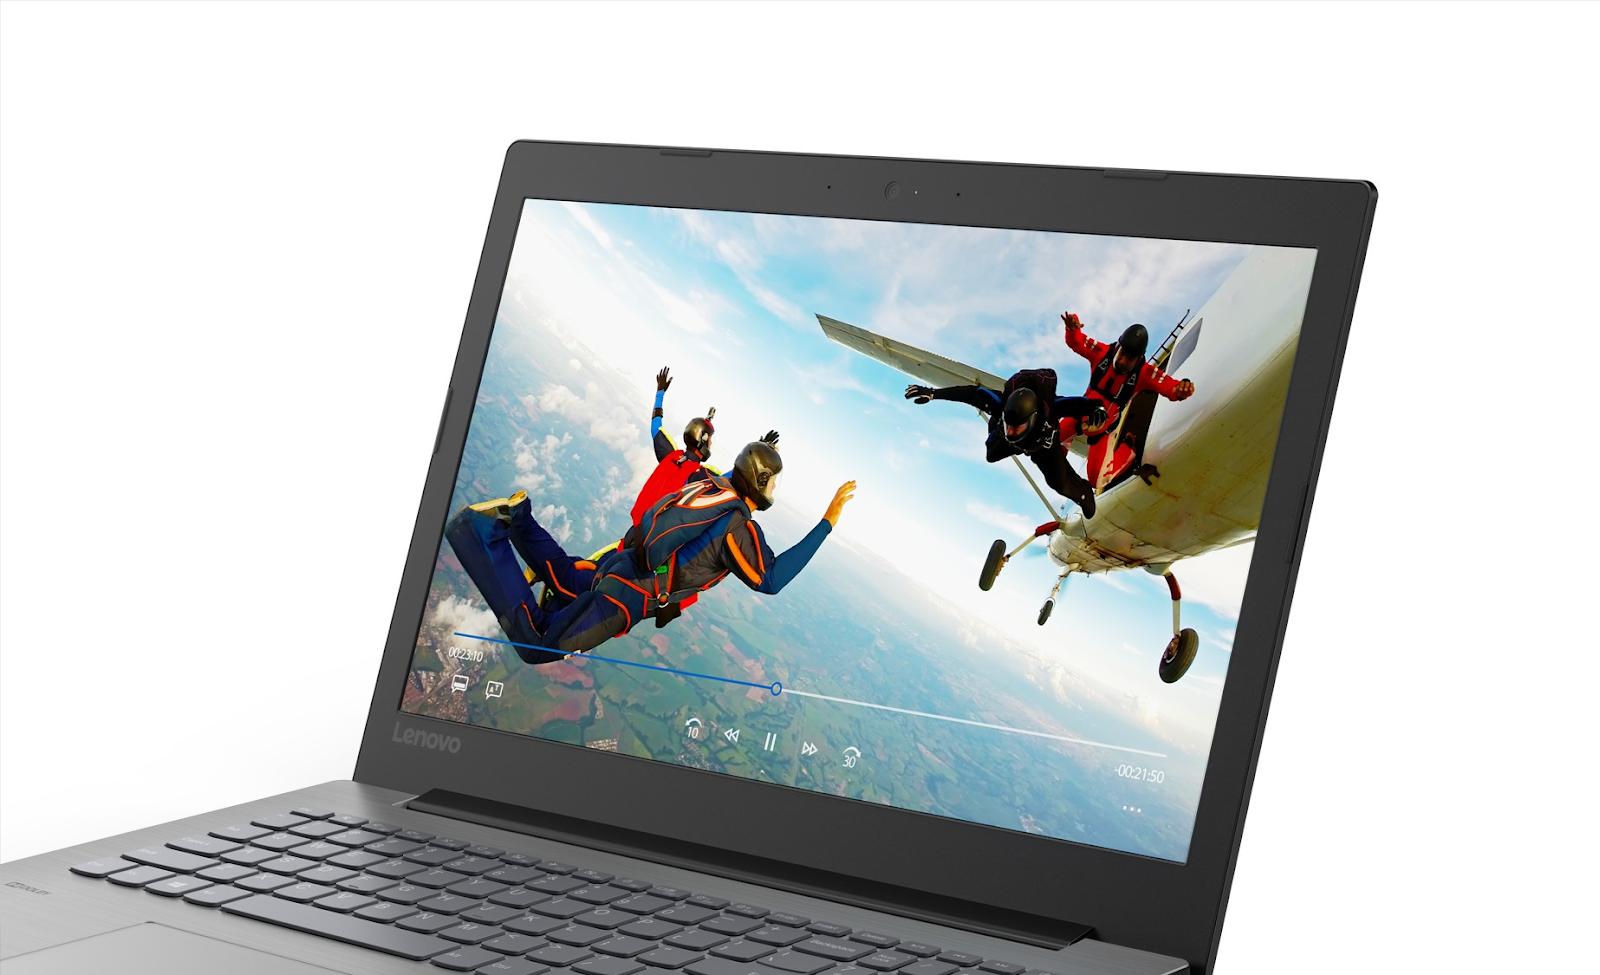 Фото 3. Ноутбук Lenovo ideapad 330-15 Onyx Black (81DE01VSRA)